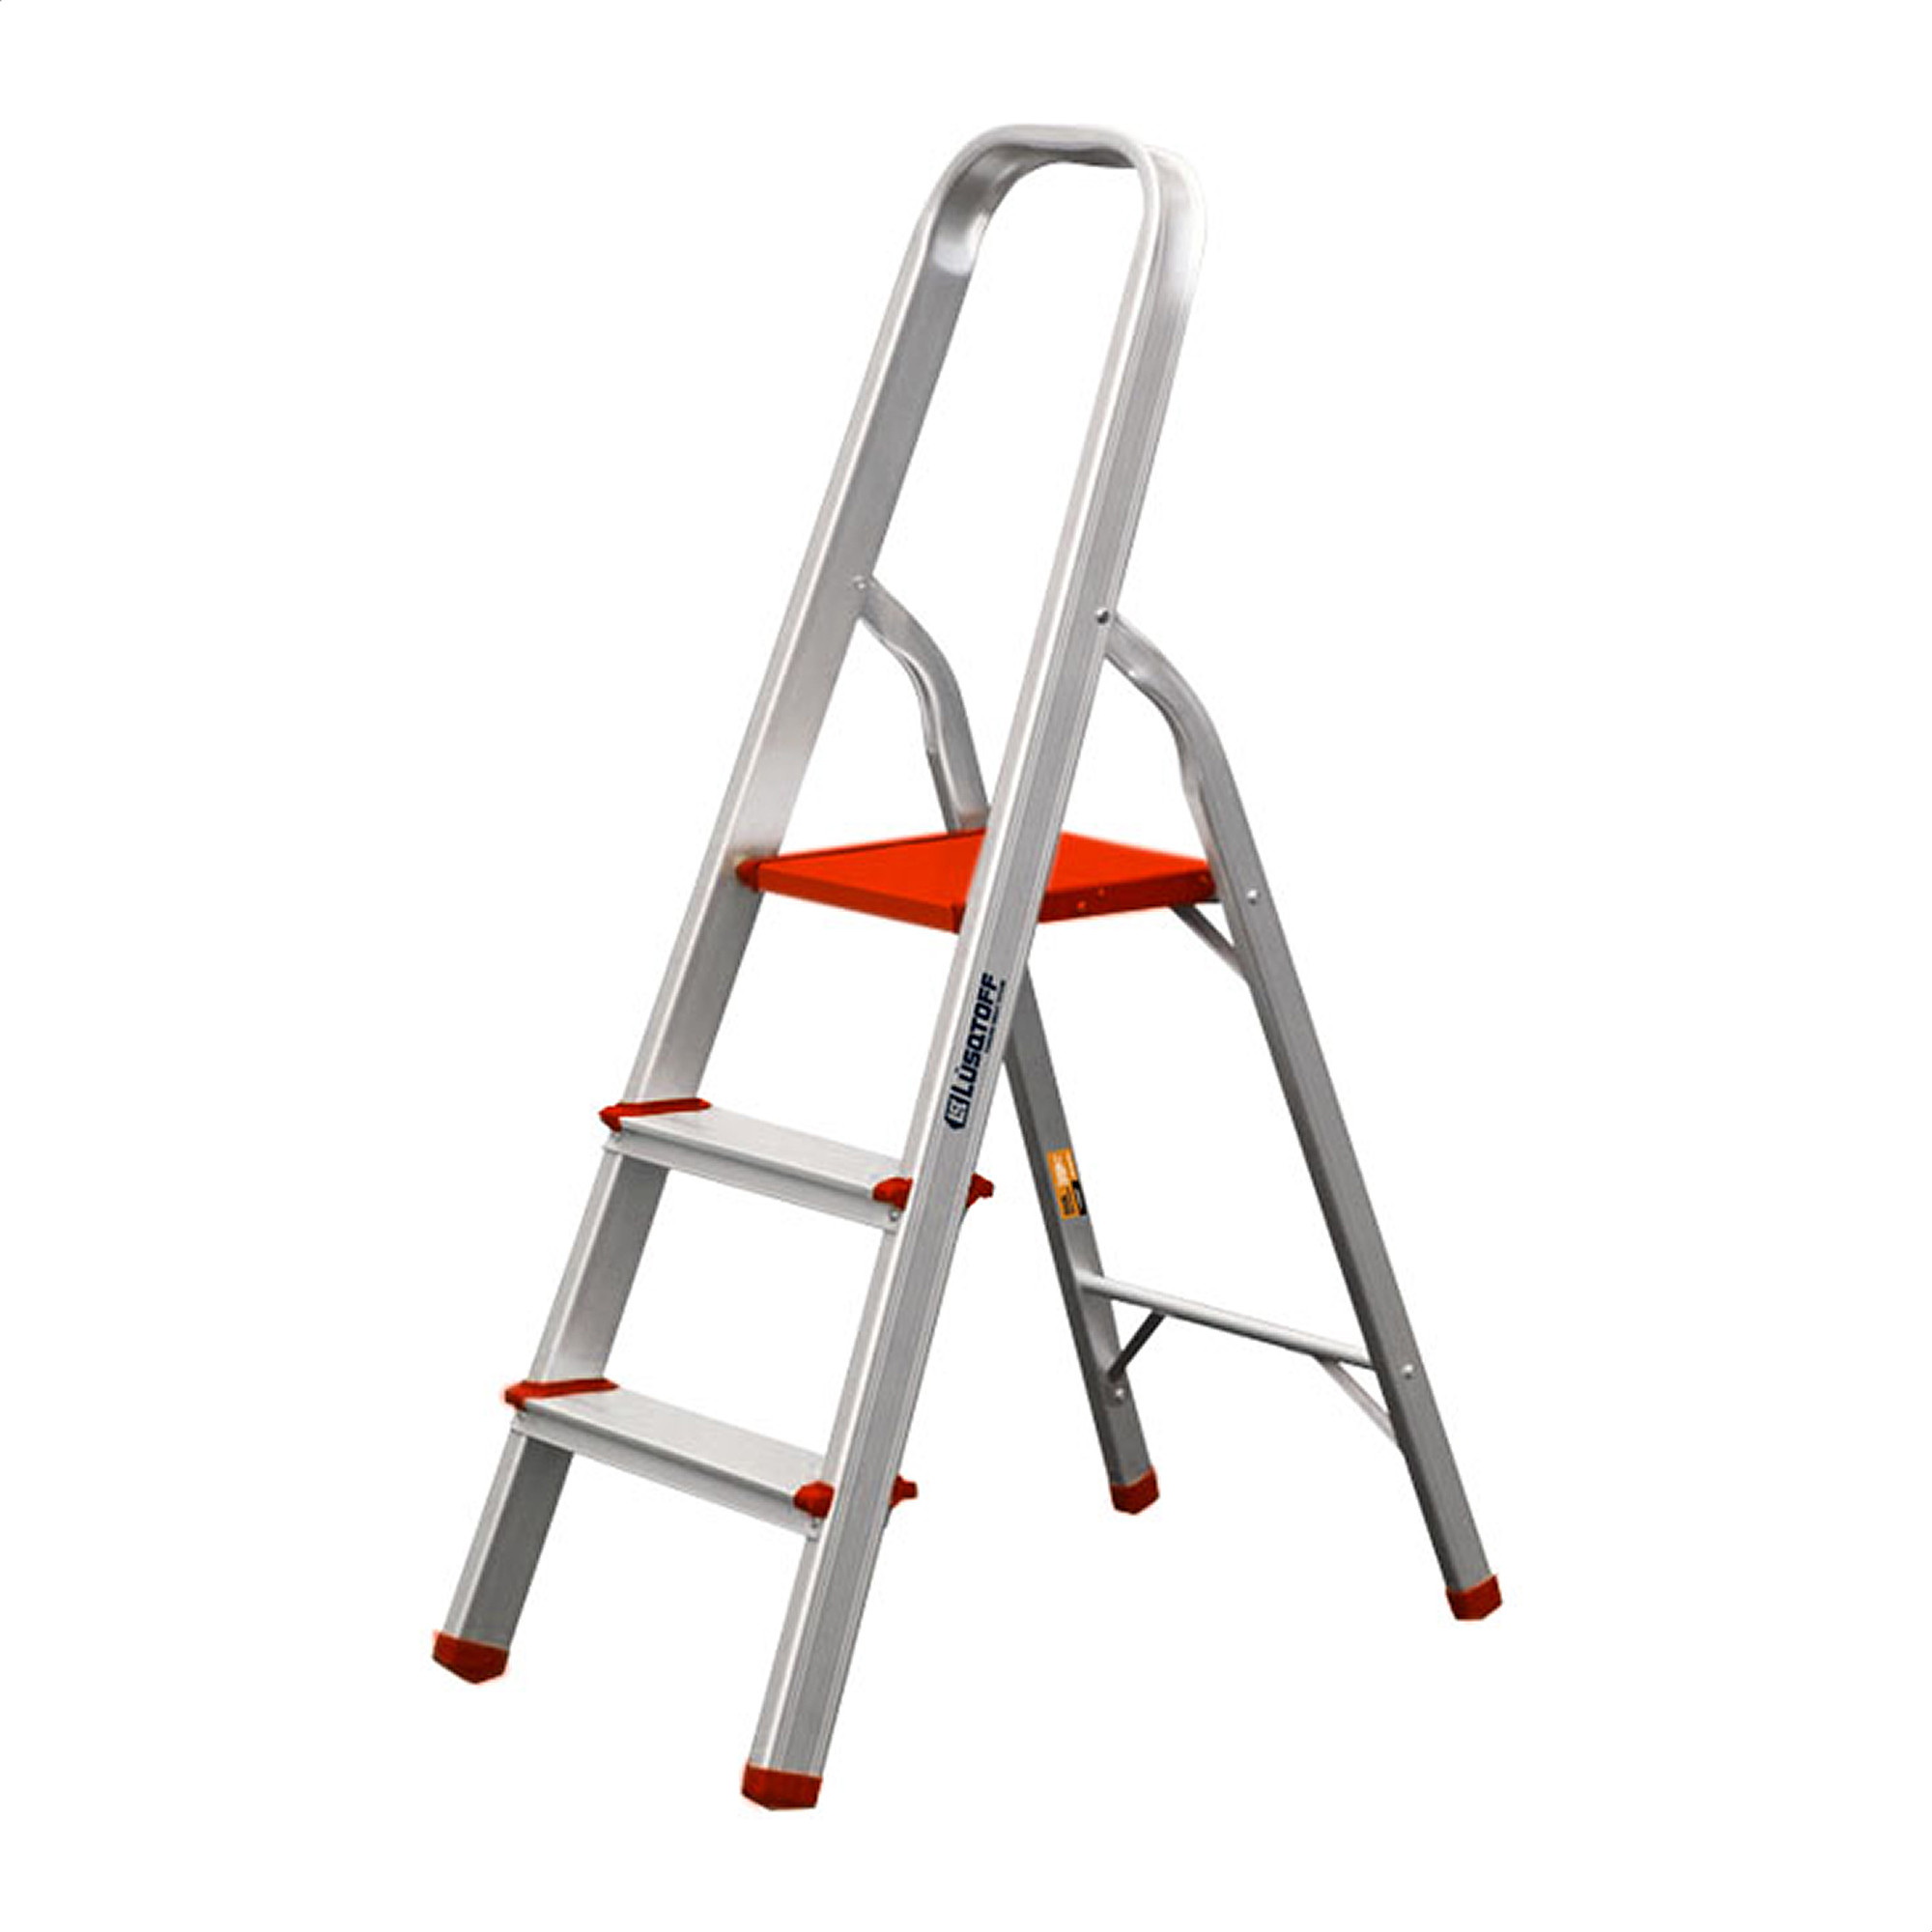 Escalera Hogareña 3 Escalones 109 Cm Aluminio / Plastico Lusqtoff ESL118-73